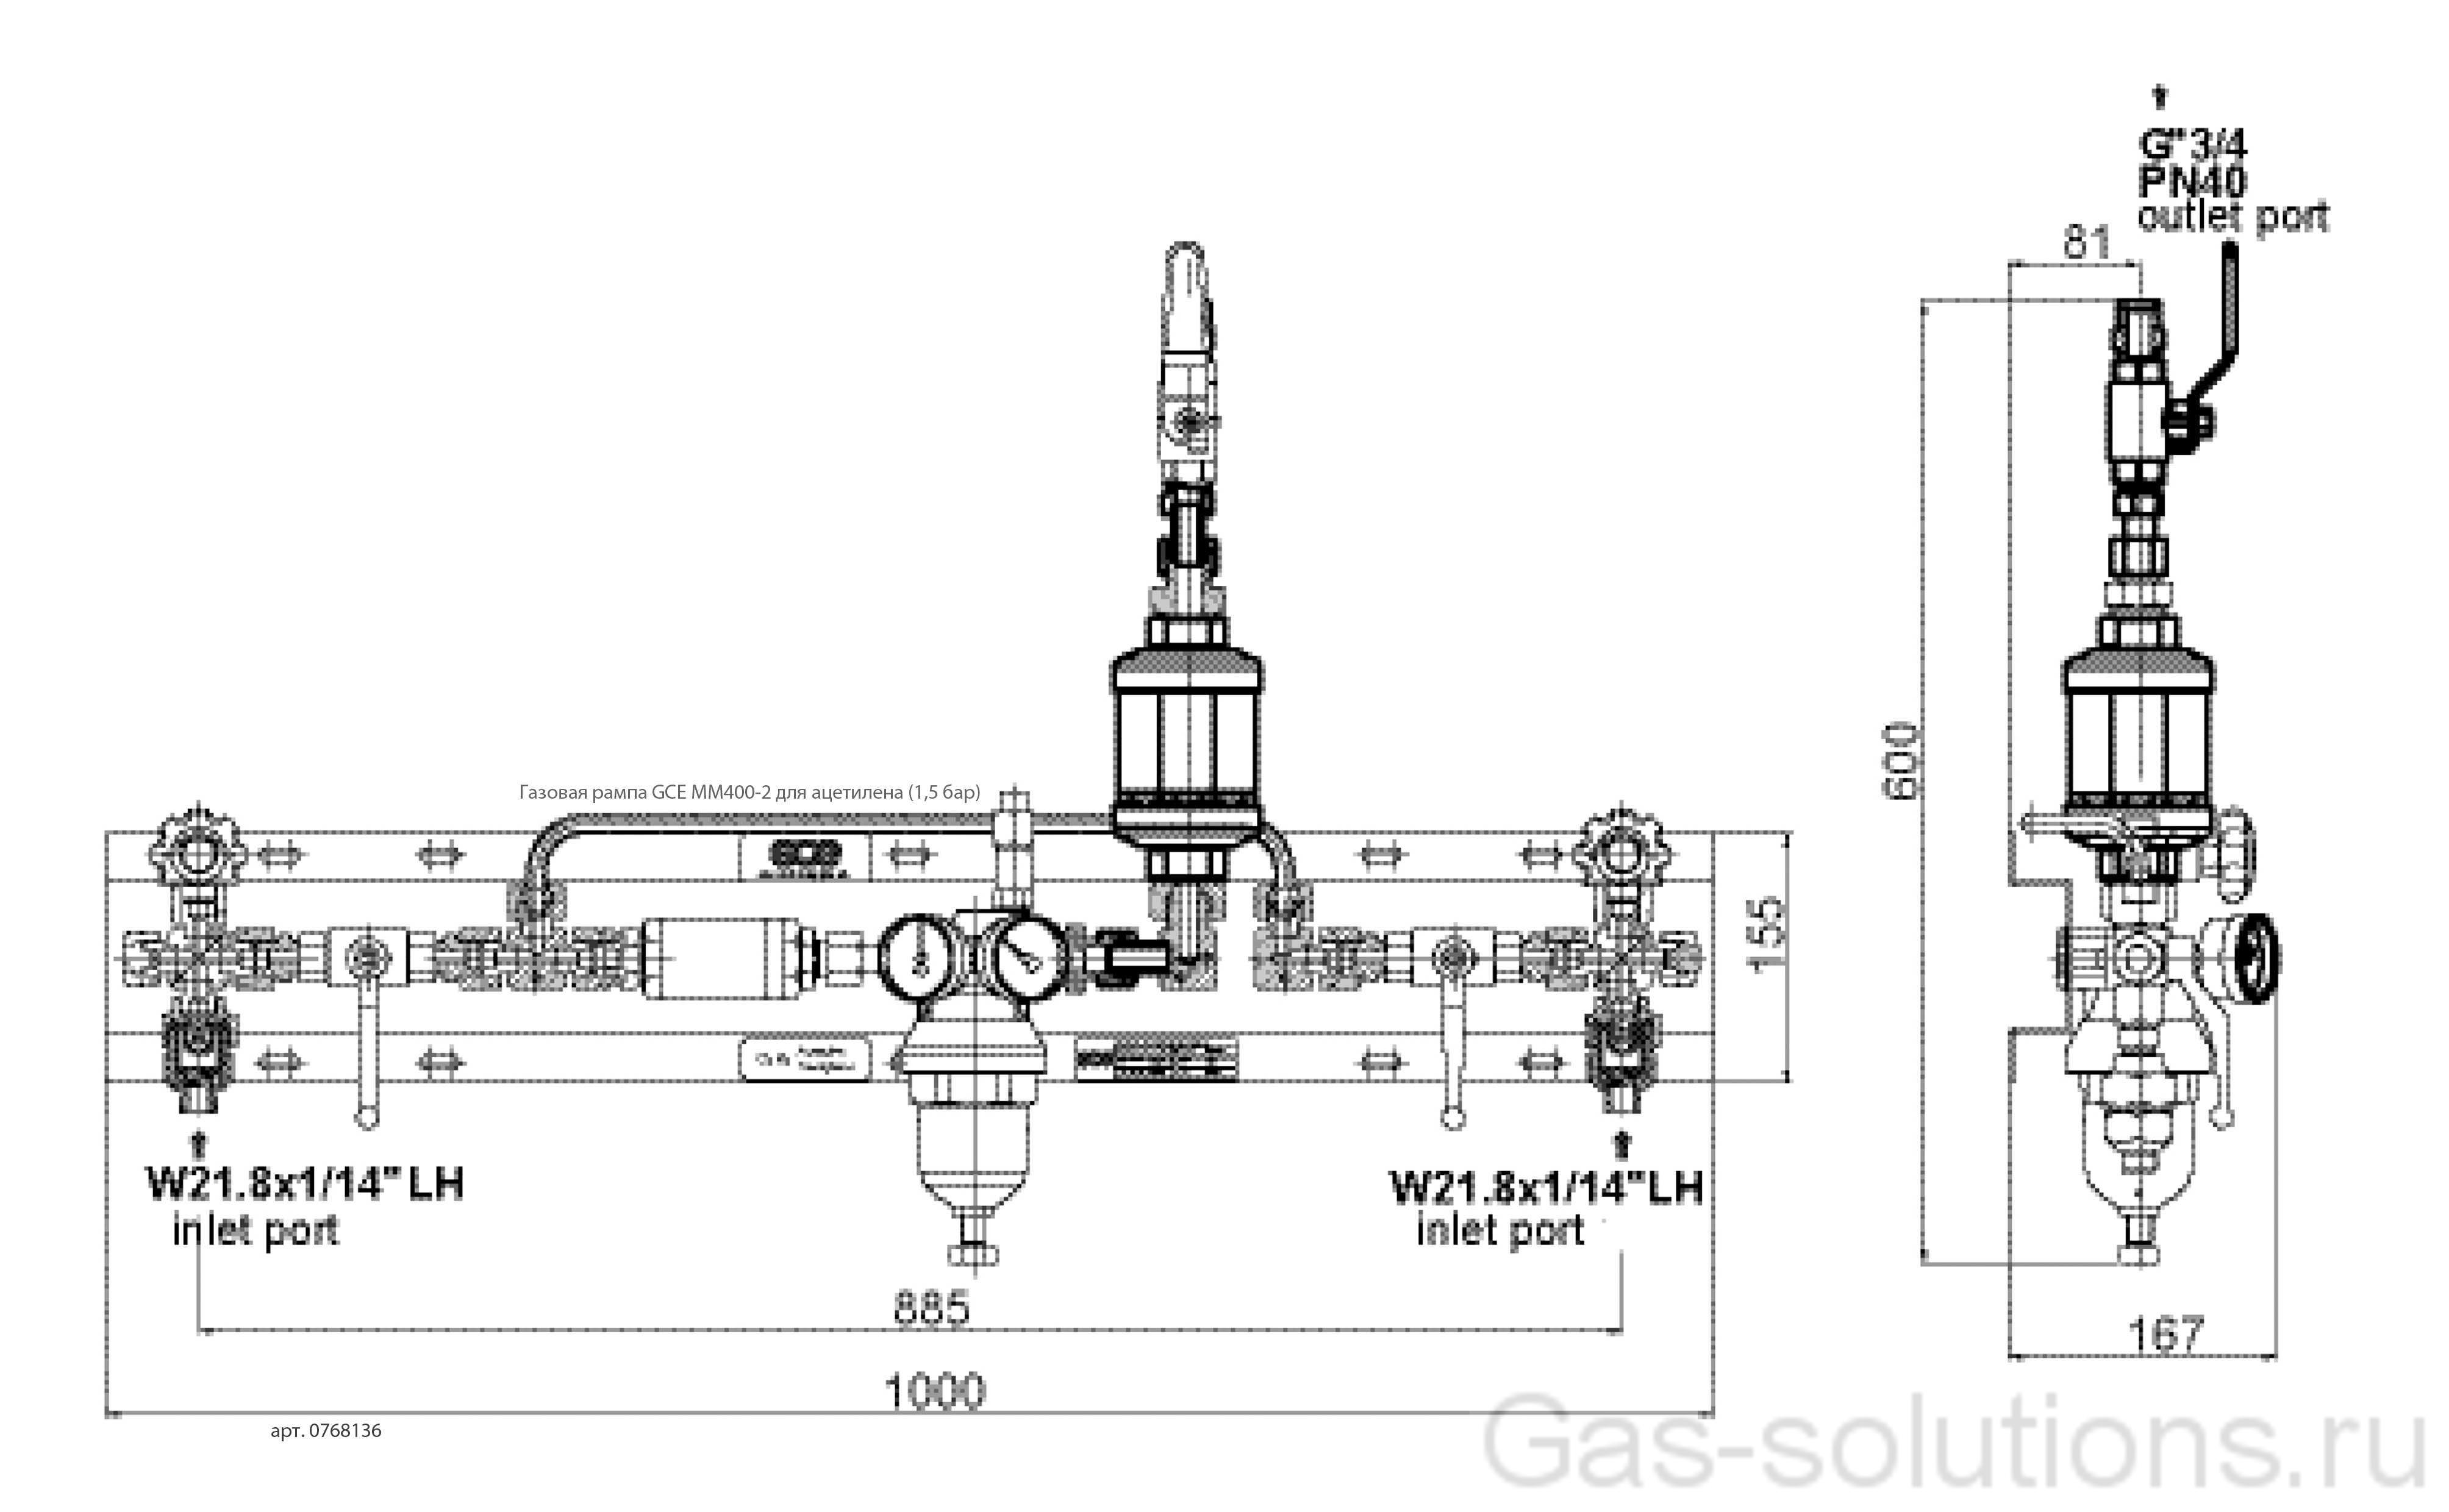 Газовая рампа GCE MM400-2 для ацетилена (1,5 бар)_чертеж